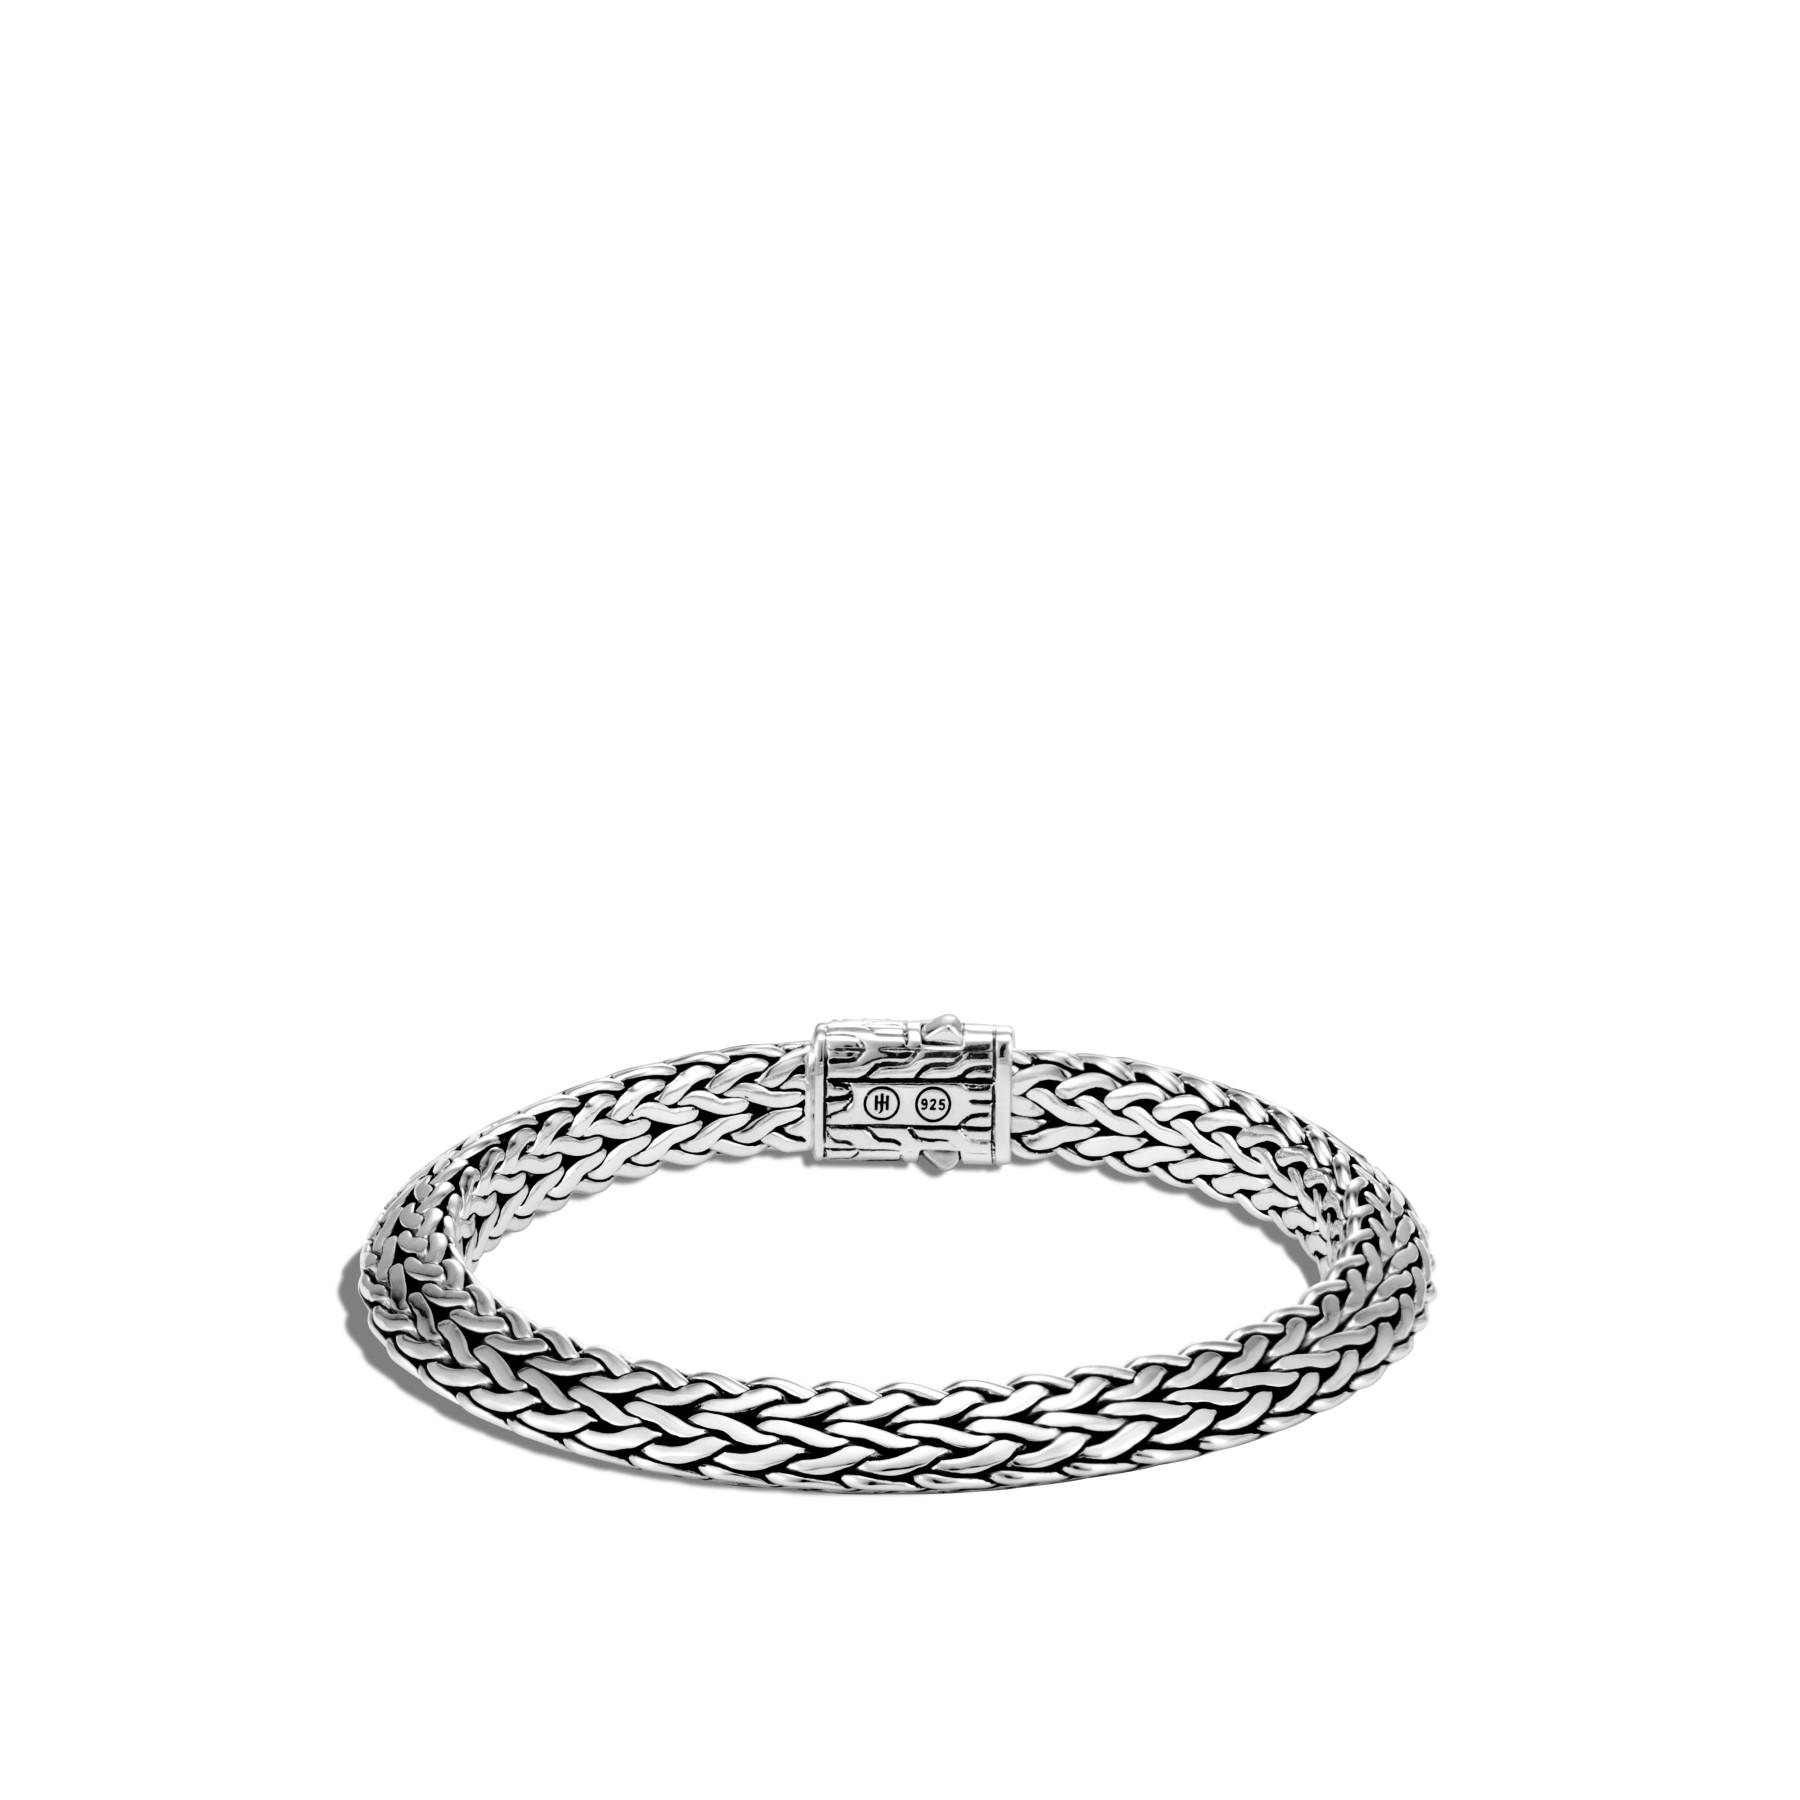 John Hardy Classic Chain Diamond Silver Bracelet - 8mm back view